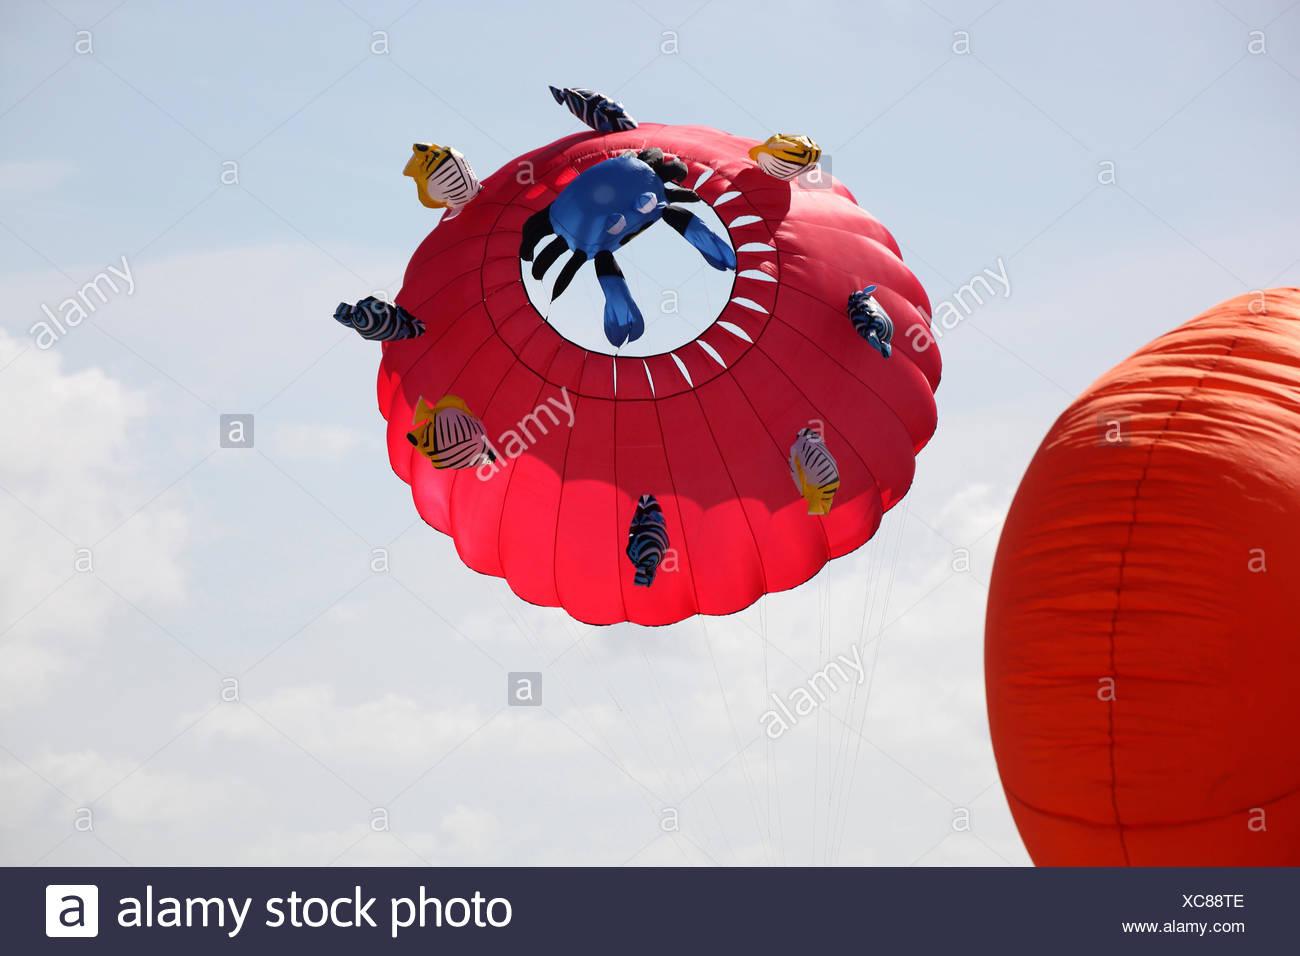 kite on the beach - Stock Image